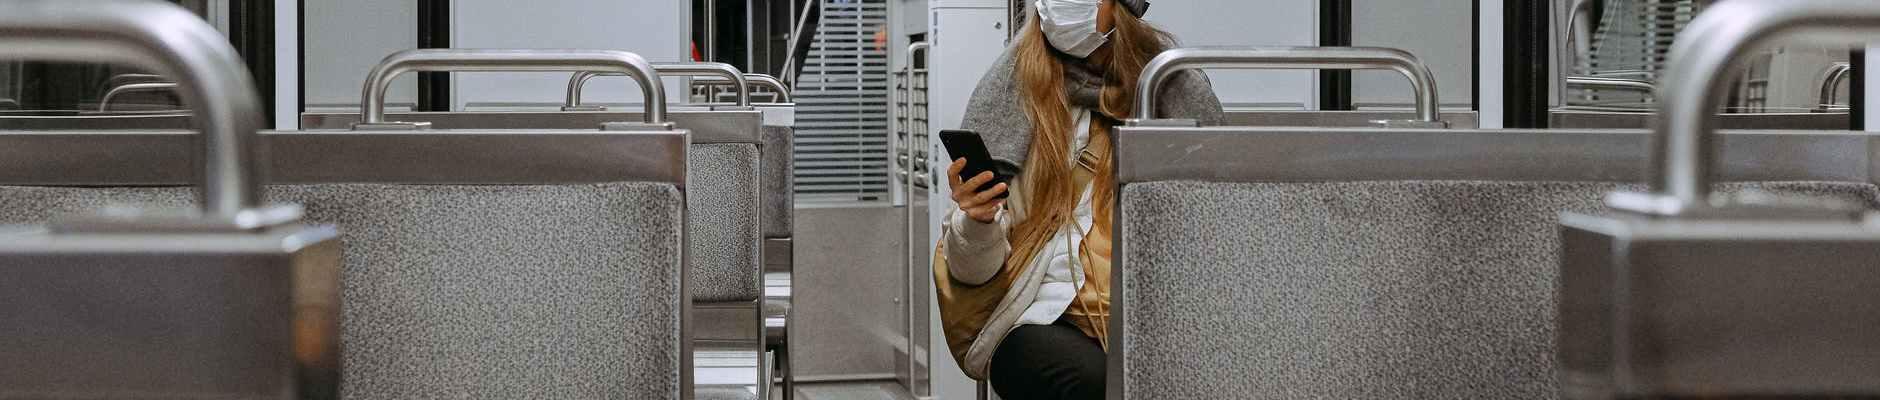 Svi se mi bojimo, woman wearing mask on train